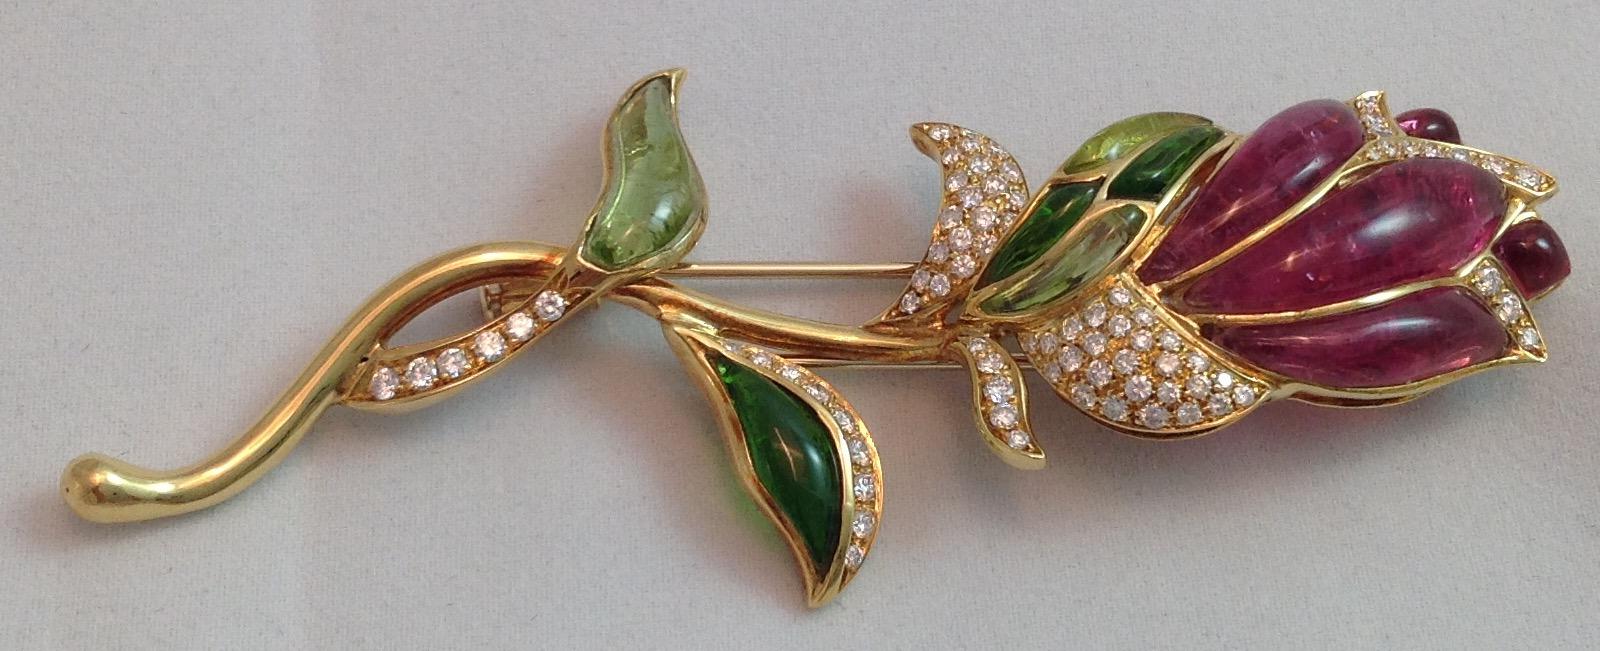 Tourmaline and Diamond Rose Brooch